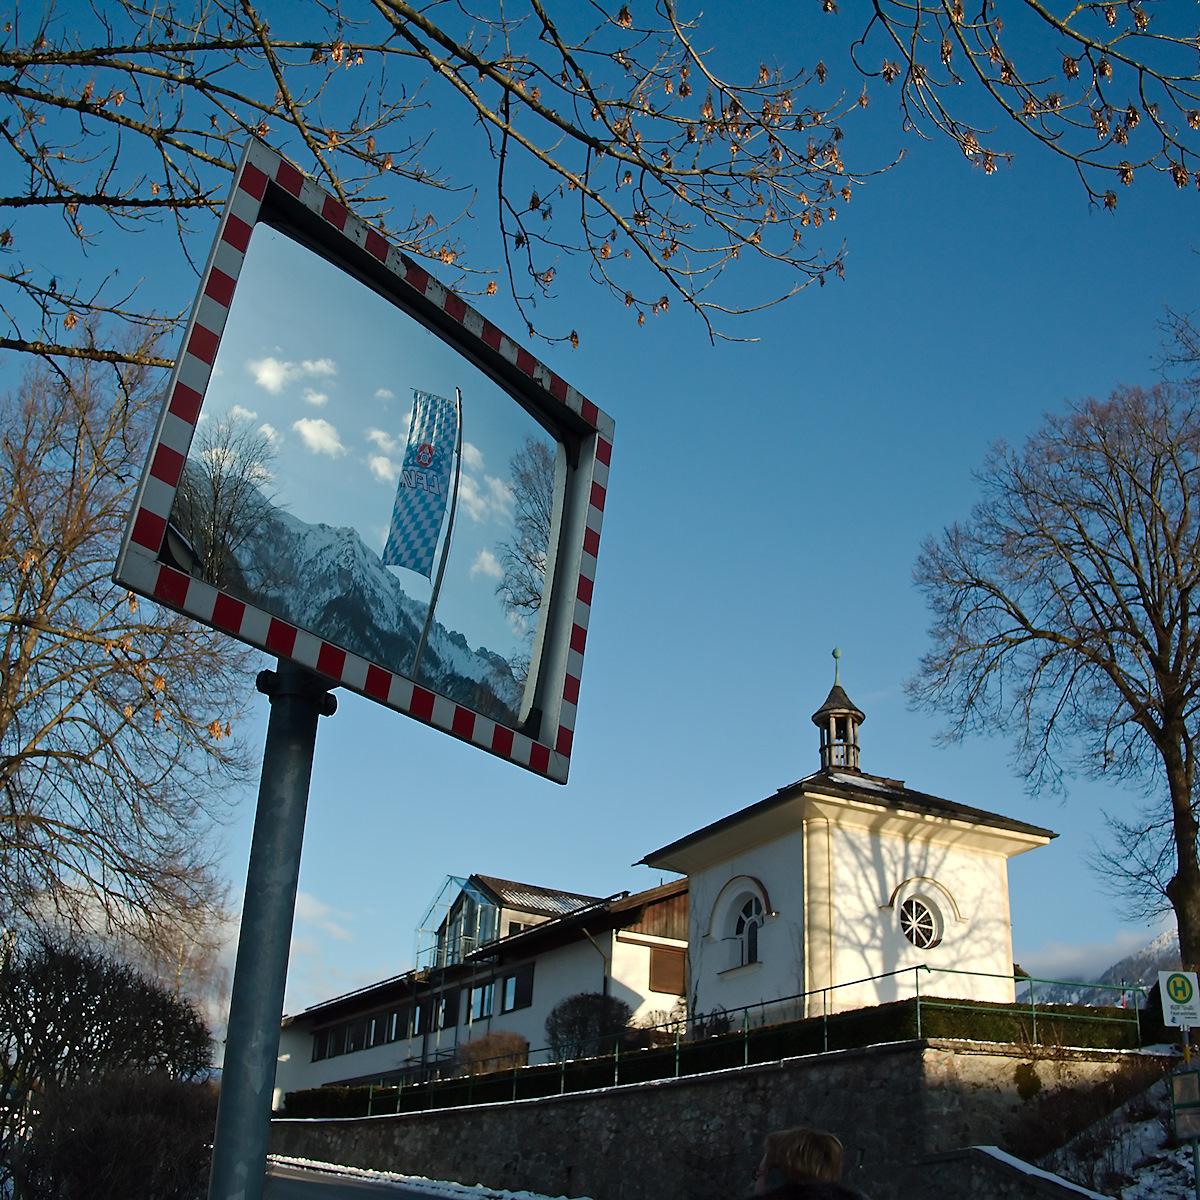 Click to enlarge: Blue Sky Bavaria [f/3.5, 1/1000 sec, 28mm-e, ISO 160, DMC-G3]